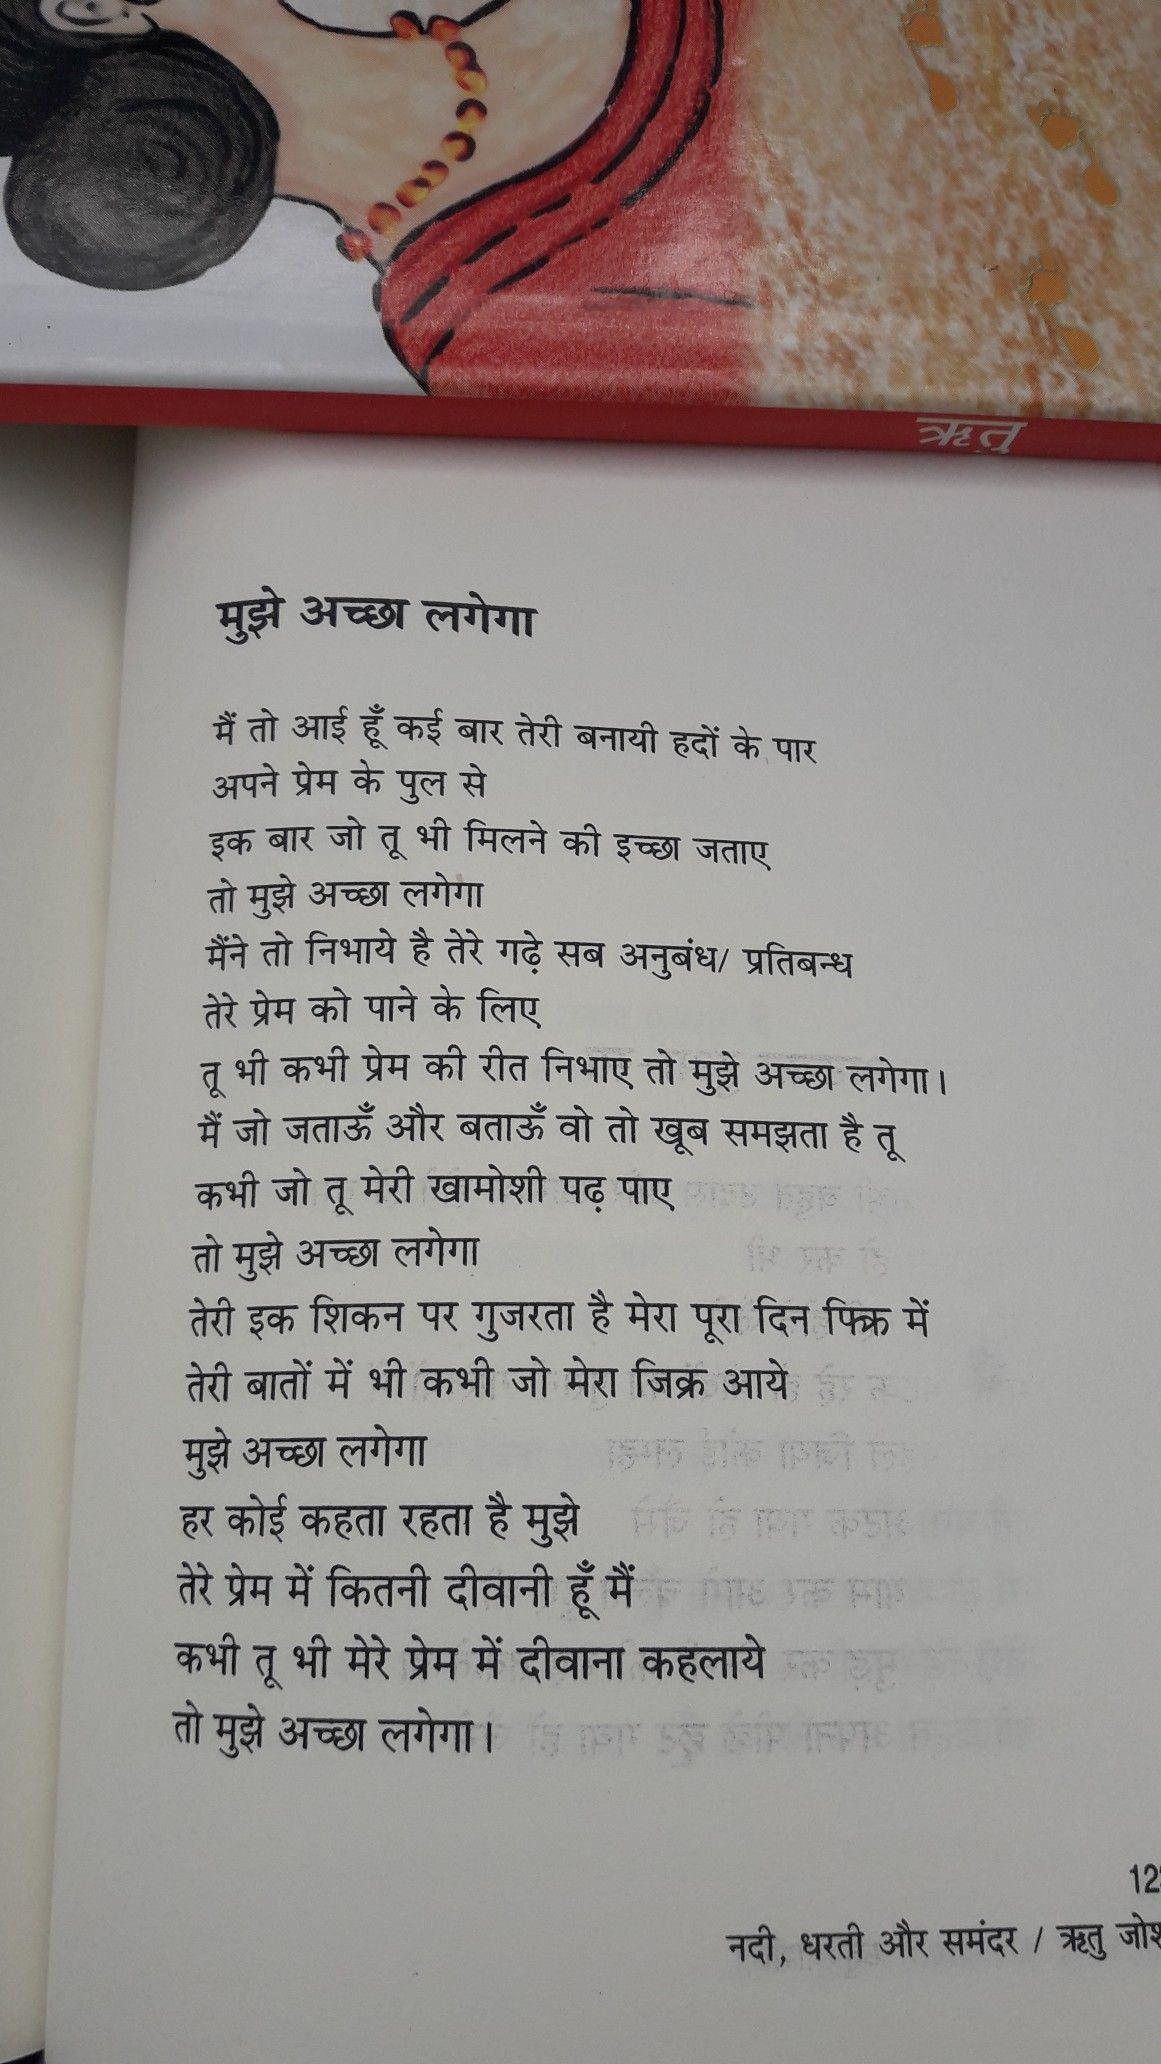 Hindi Poetry Shayari Poem Bookexcrepts Hritu Joshi Hindi Poetry Shayari Poem Bookexcrepts Hritu Joshi Love Quotes Poetry Poetry Hindi Love Poems In Hindi